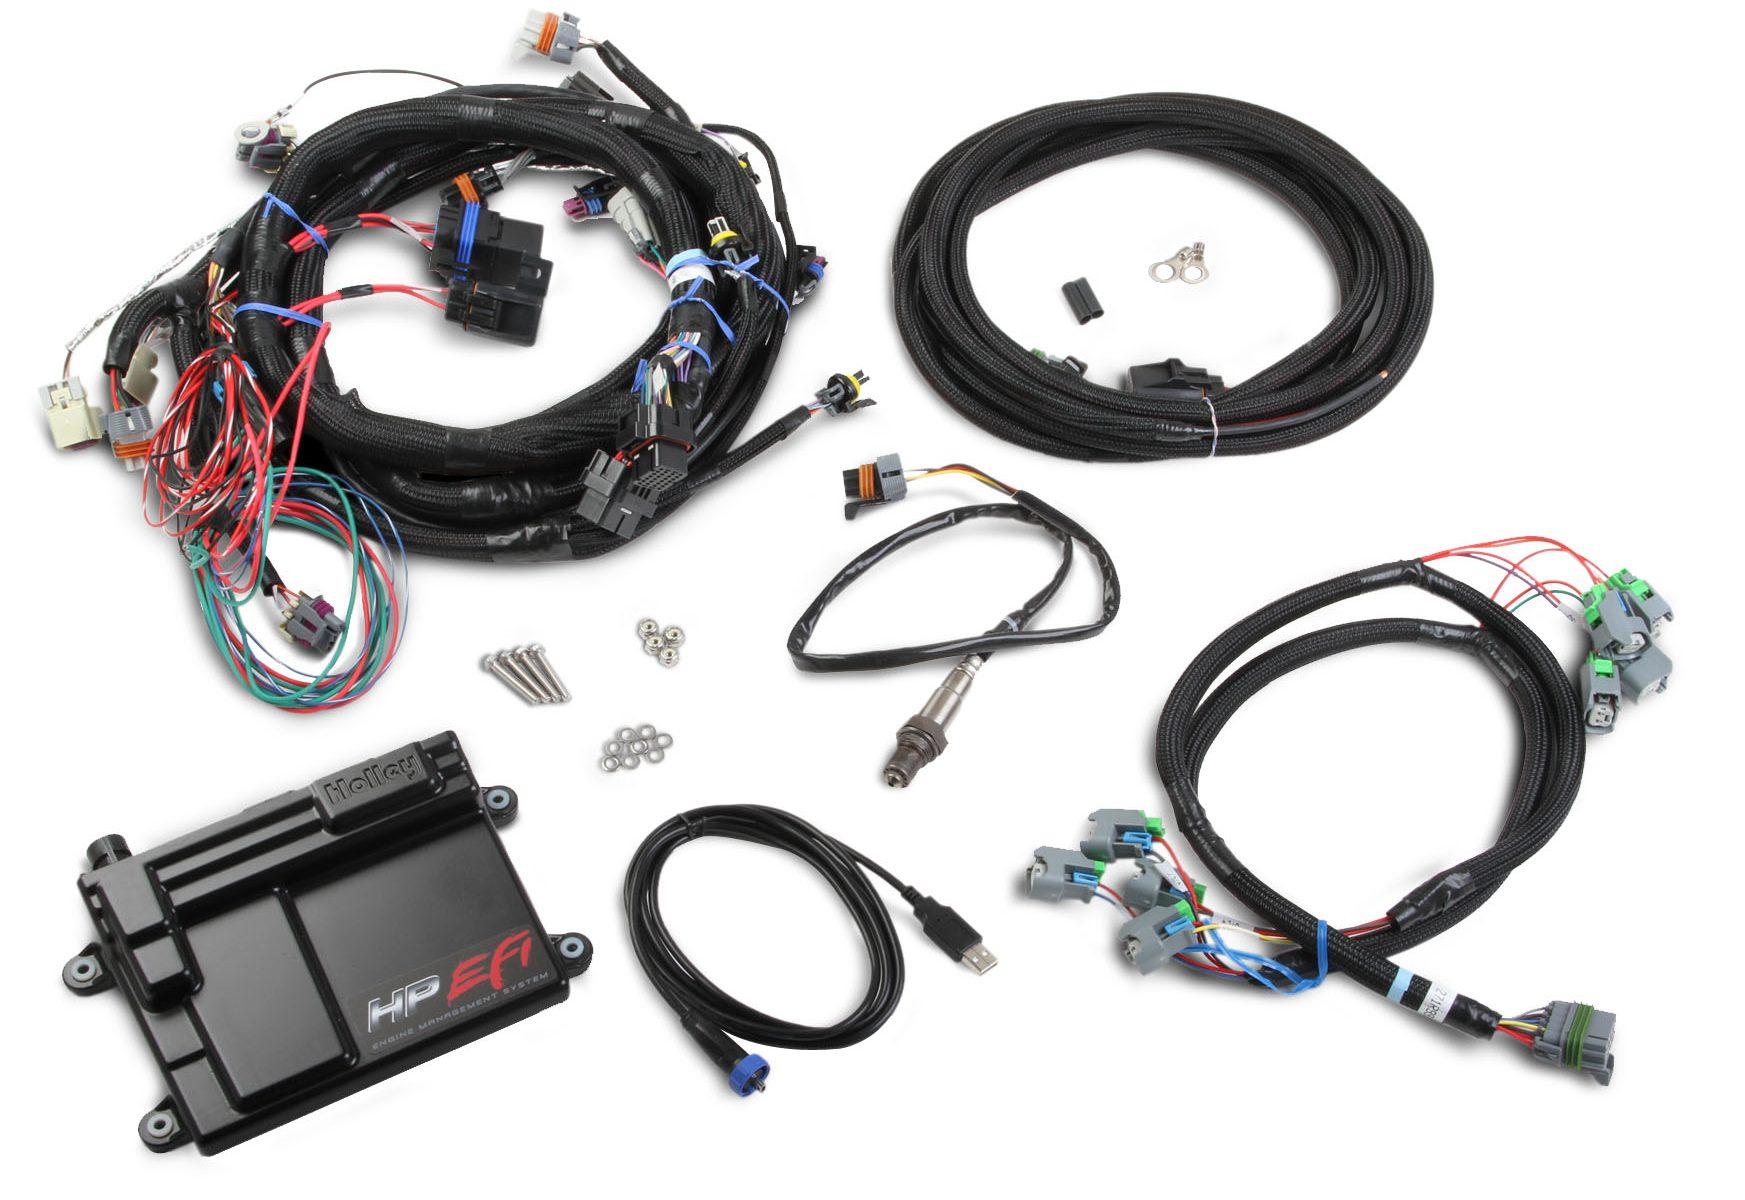 small resolution of home shop wiring harness holley gm ls2 ls3 ls7 hp efi ecu harness kits